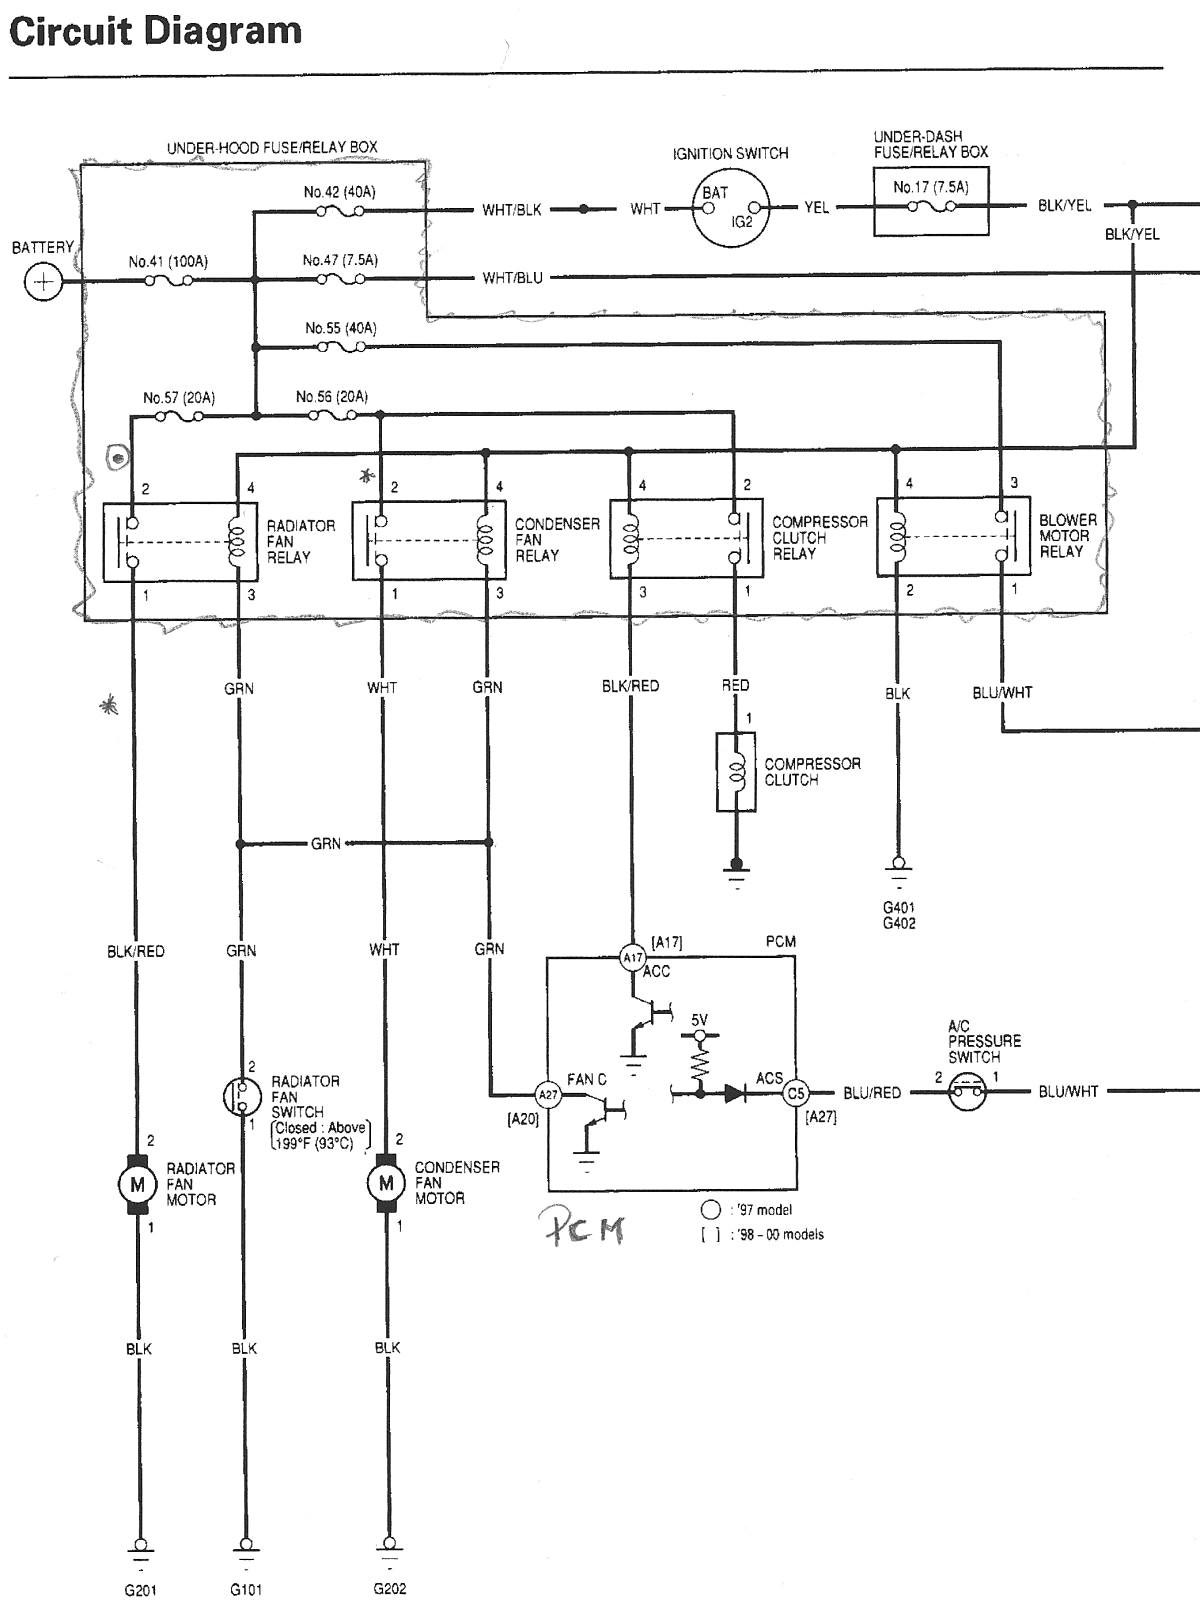 2000 Honda Civic Engine Diagram 2000 Honda Accord Engine Diagram Of 2000 Honda Civic Engine Diagram